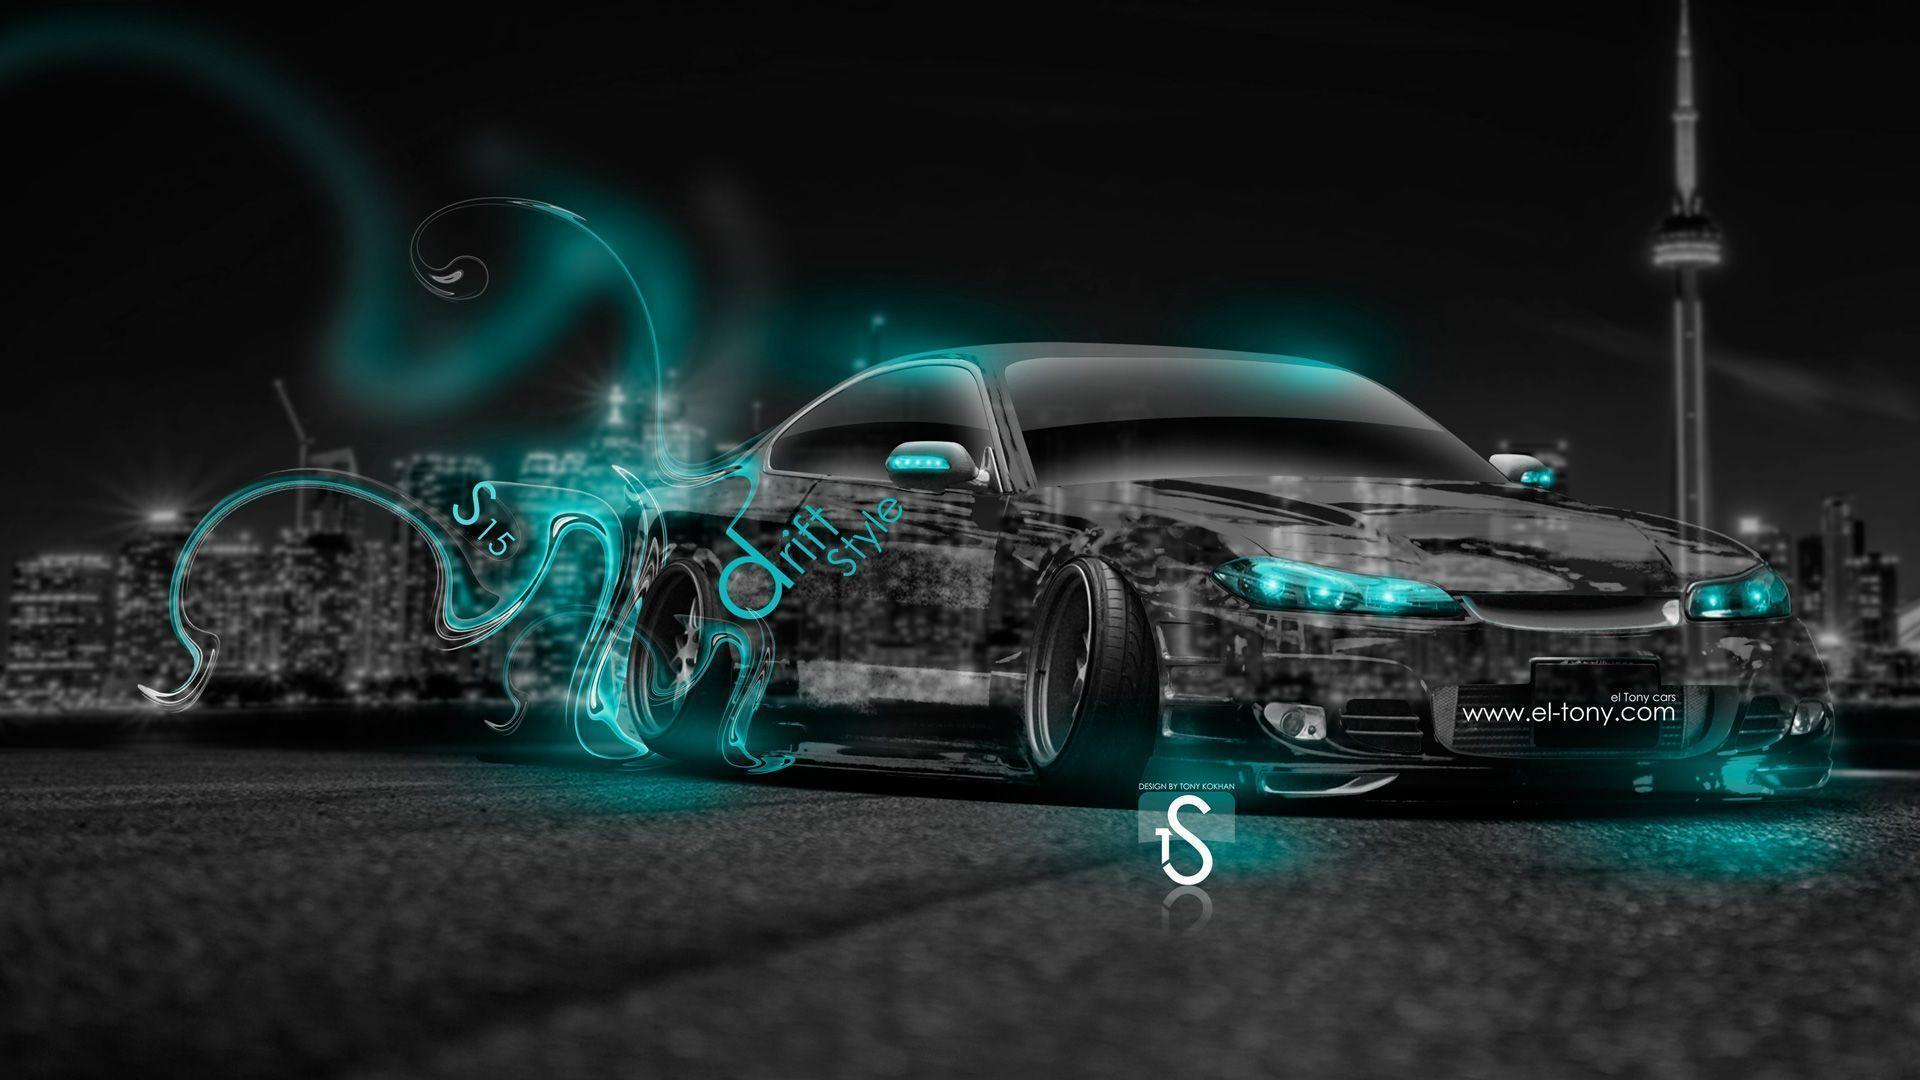 Charmant Nissan Silvia S15 JDM Crystal Drift Style Car 2014 « El Tony